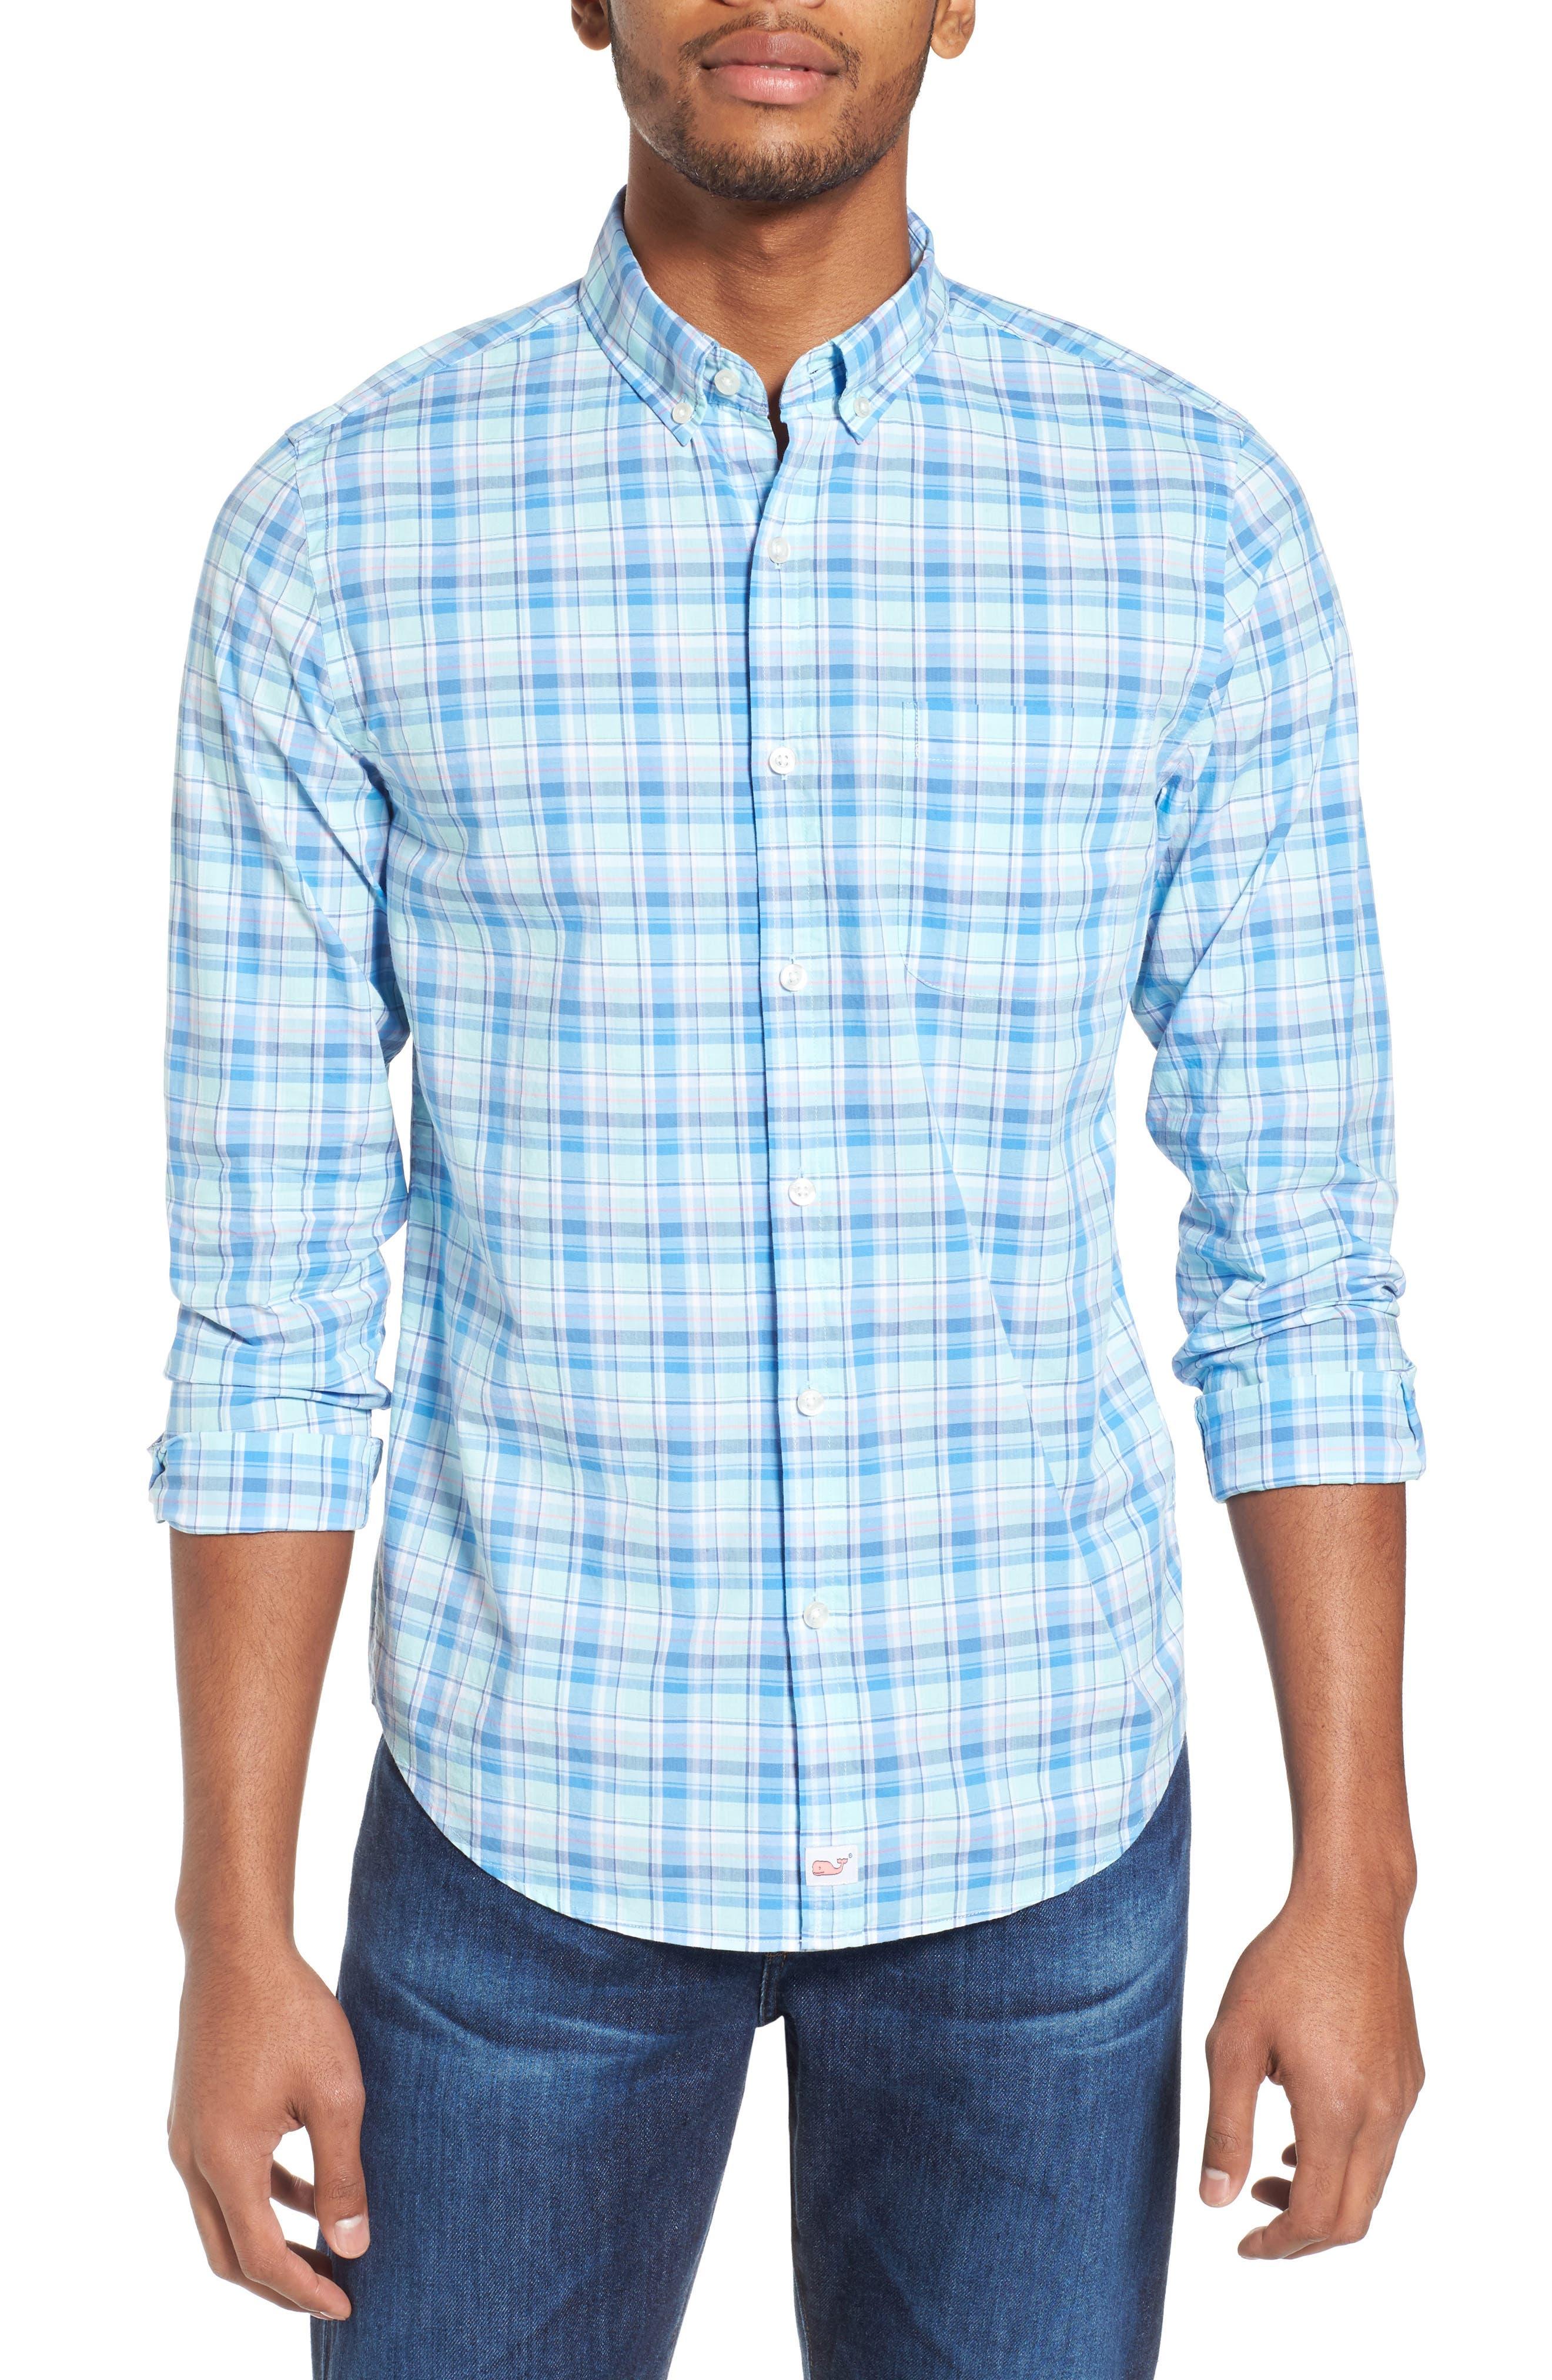 Murray Pine Island Slim Fit Plaid Sport Shirt,                             Main thumbnail 1, color,                             Sea Splash